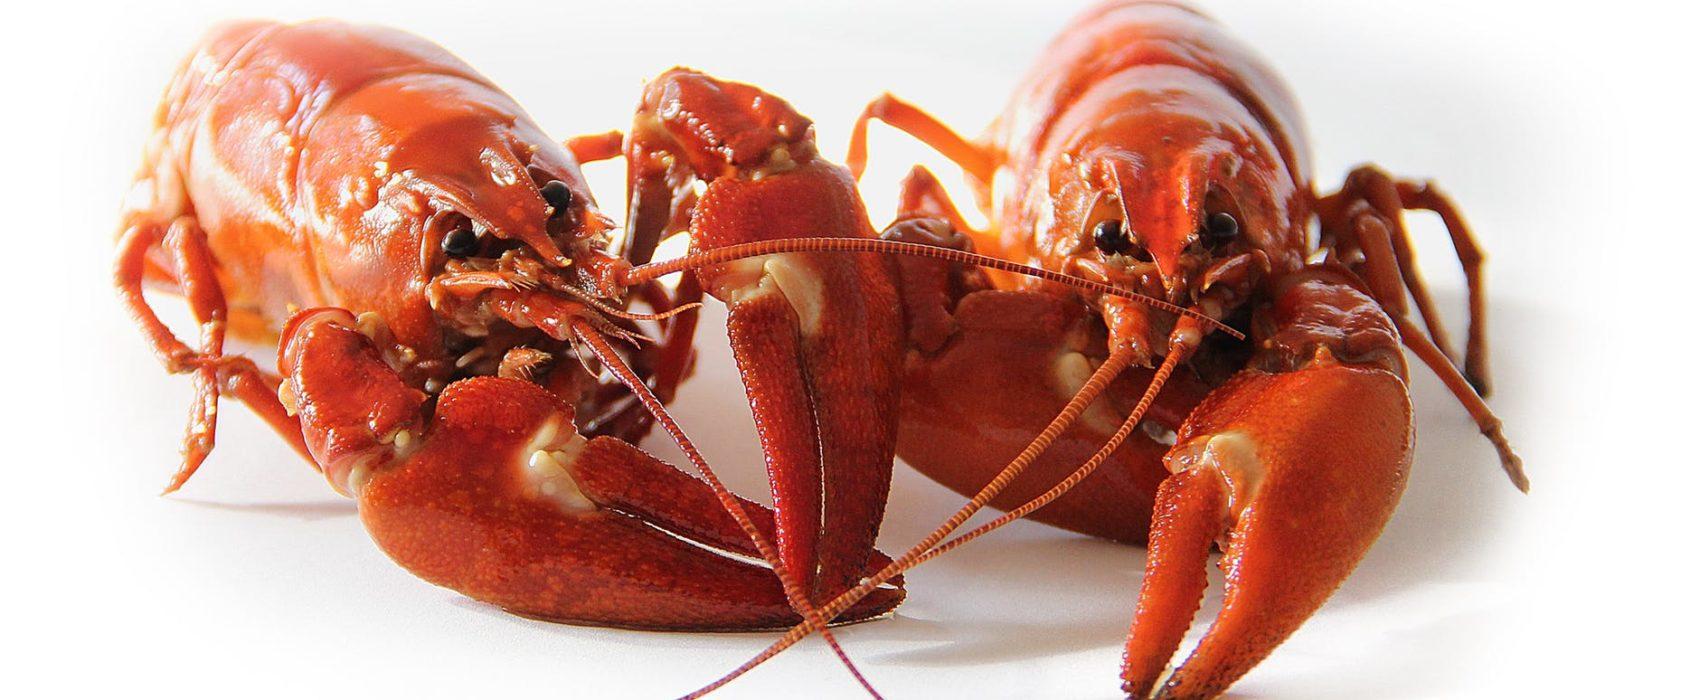 crab dden seafood Dden Accra Ghana